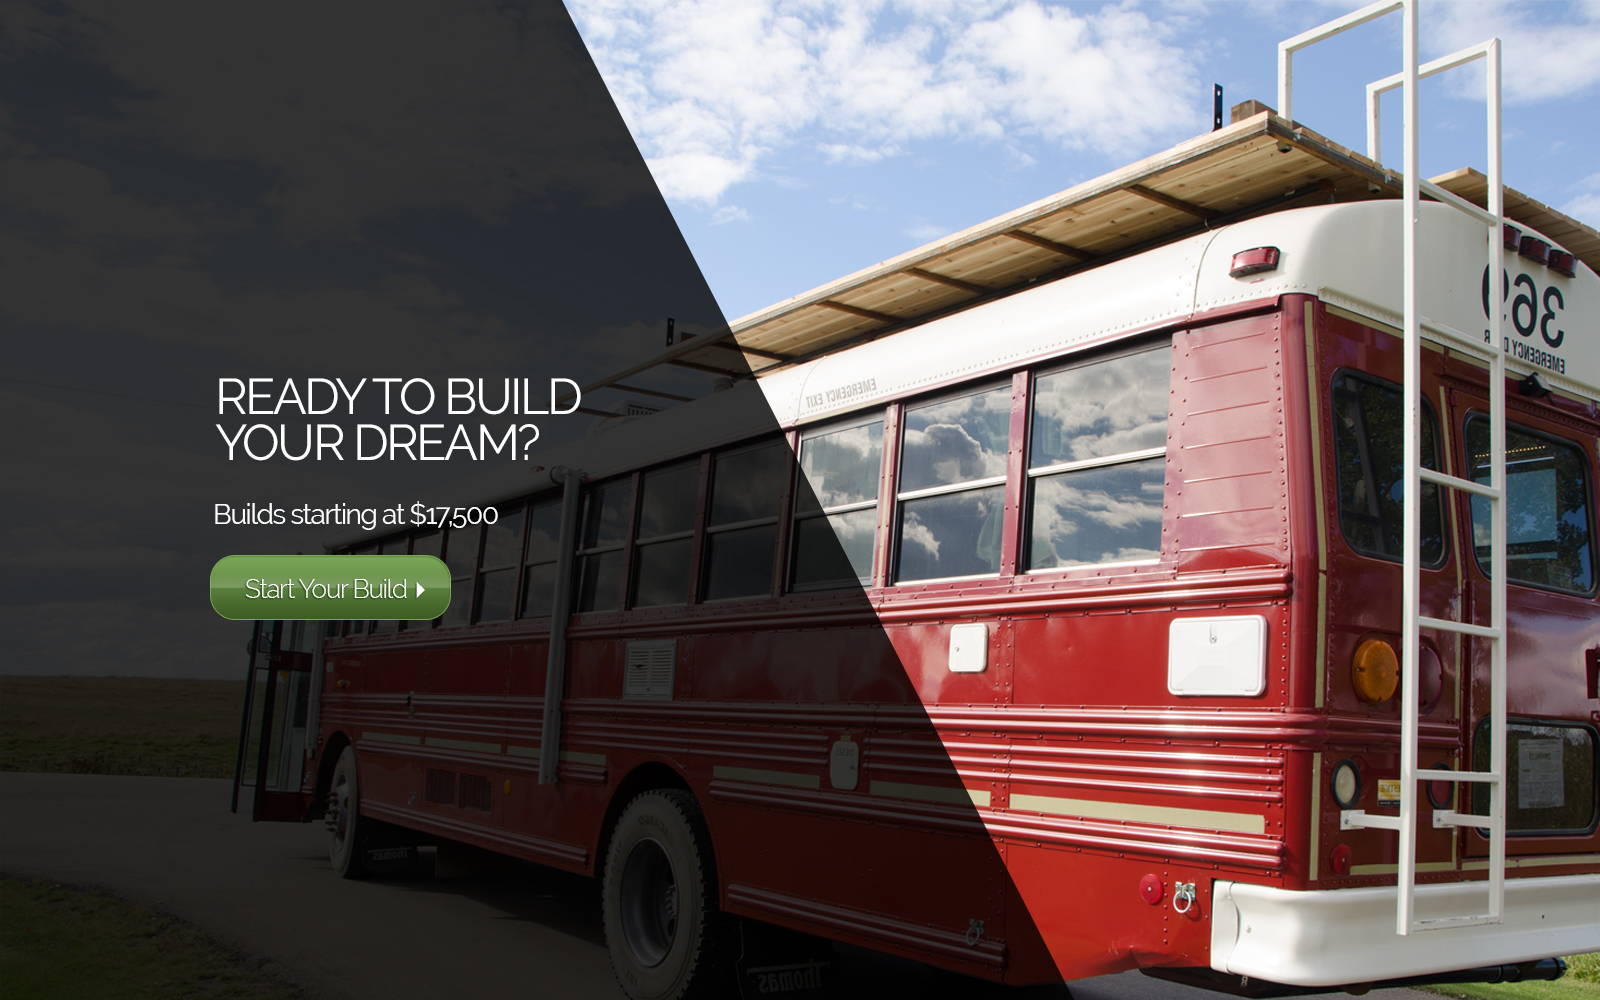 School bus conversion - start your build